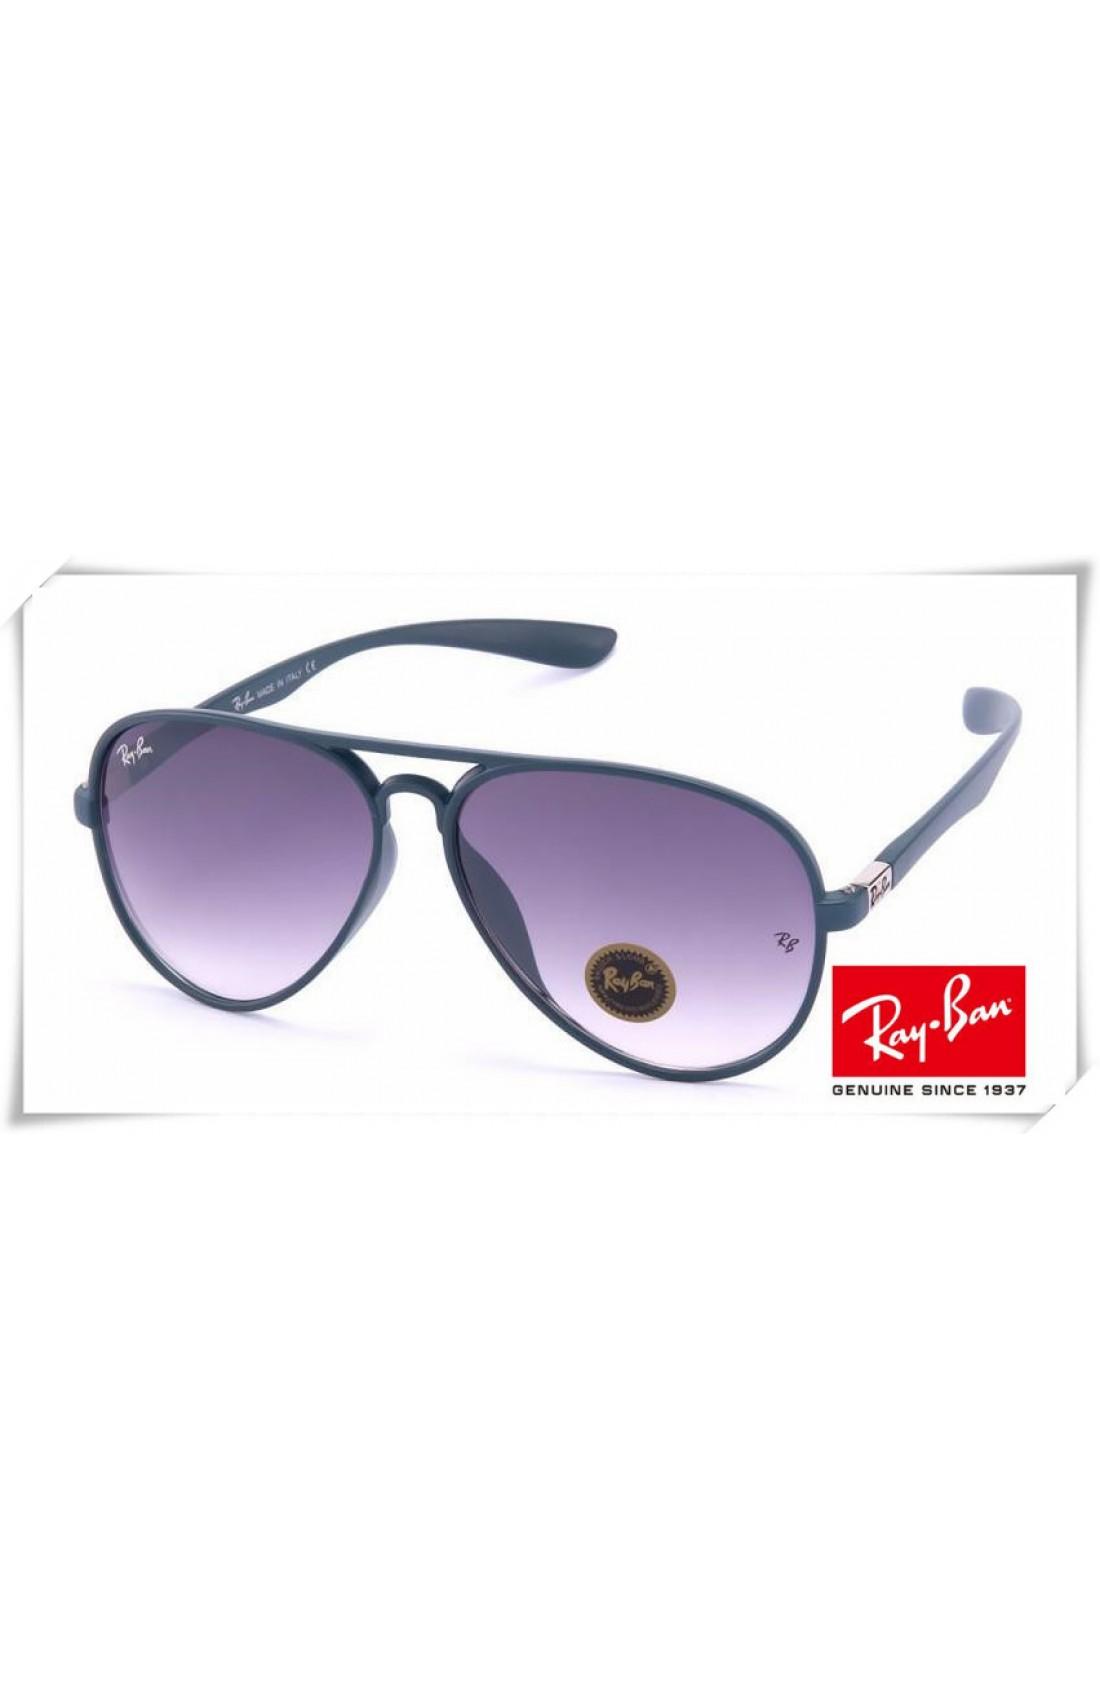 19fca9b05f1 Cheap Replica Ray Ban RB4180 Aviator Sunglasses Blue Grey Frame ...